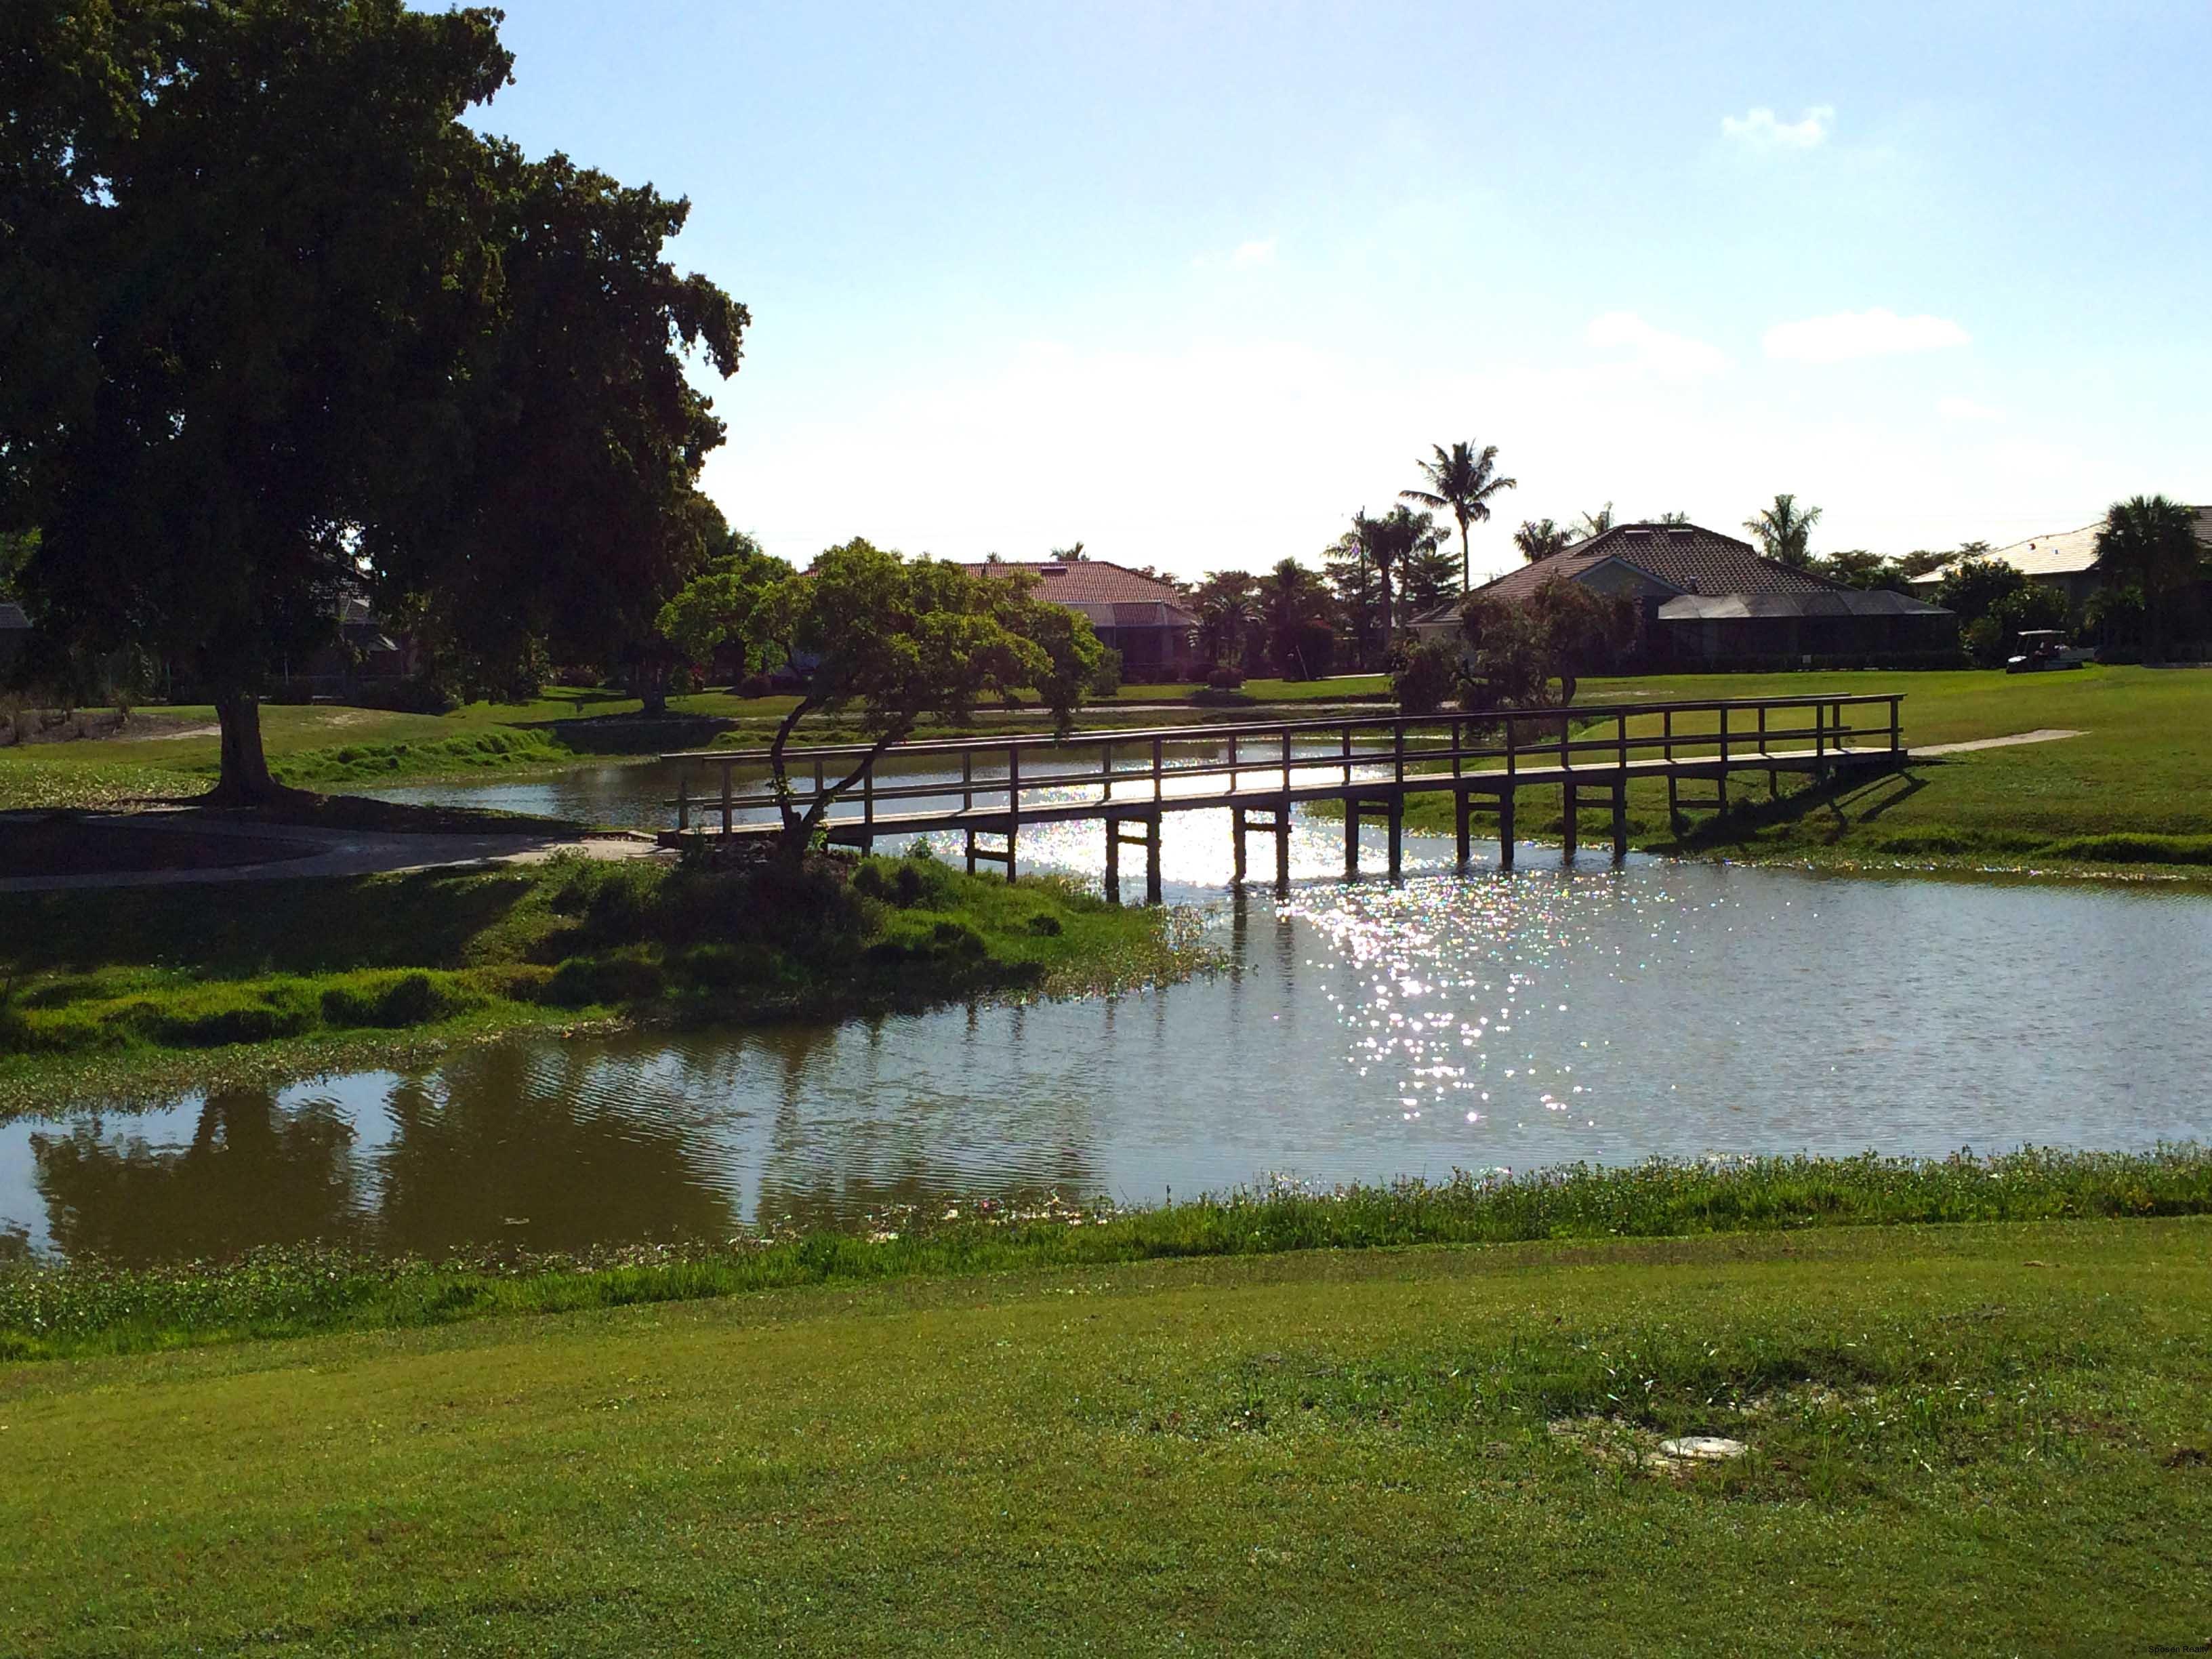 cape-coral-ammenities-cape-royale-golf-cart-path.jpg